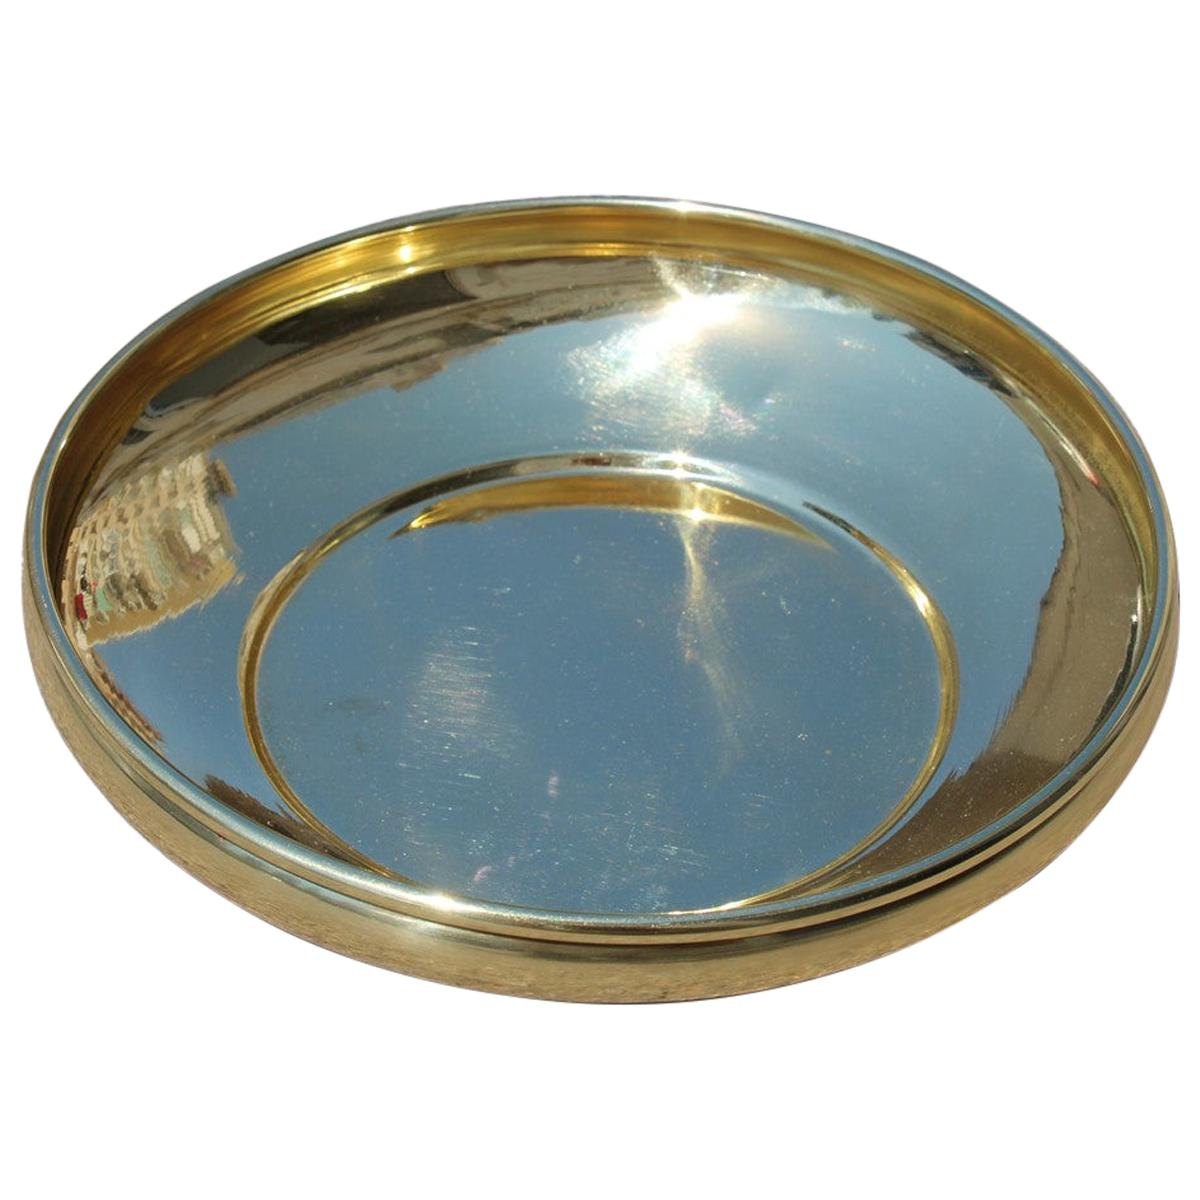 Decorative Round Brass Gold Bowl Midcentury Italian Design